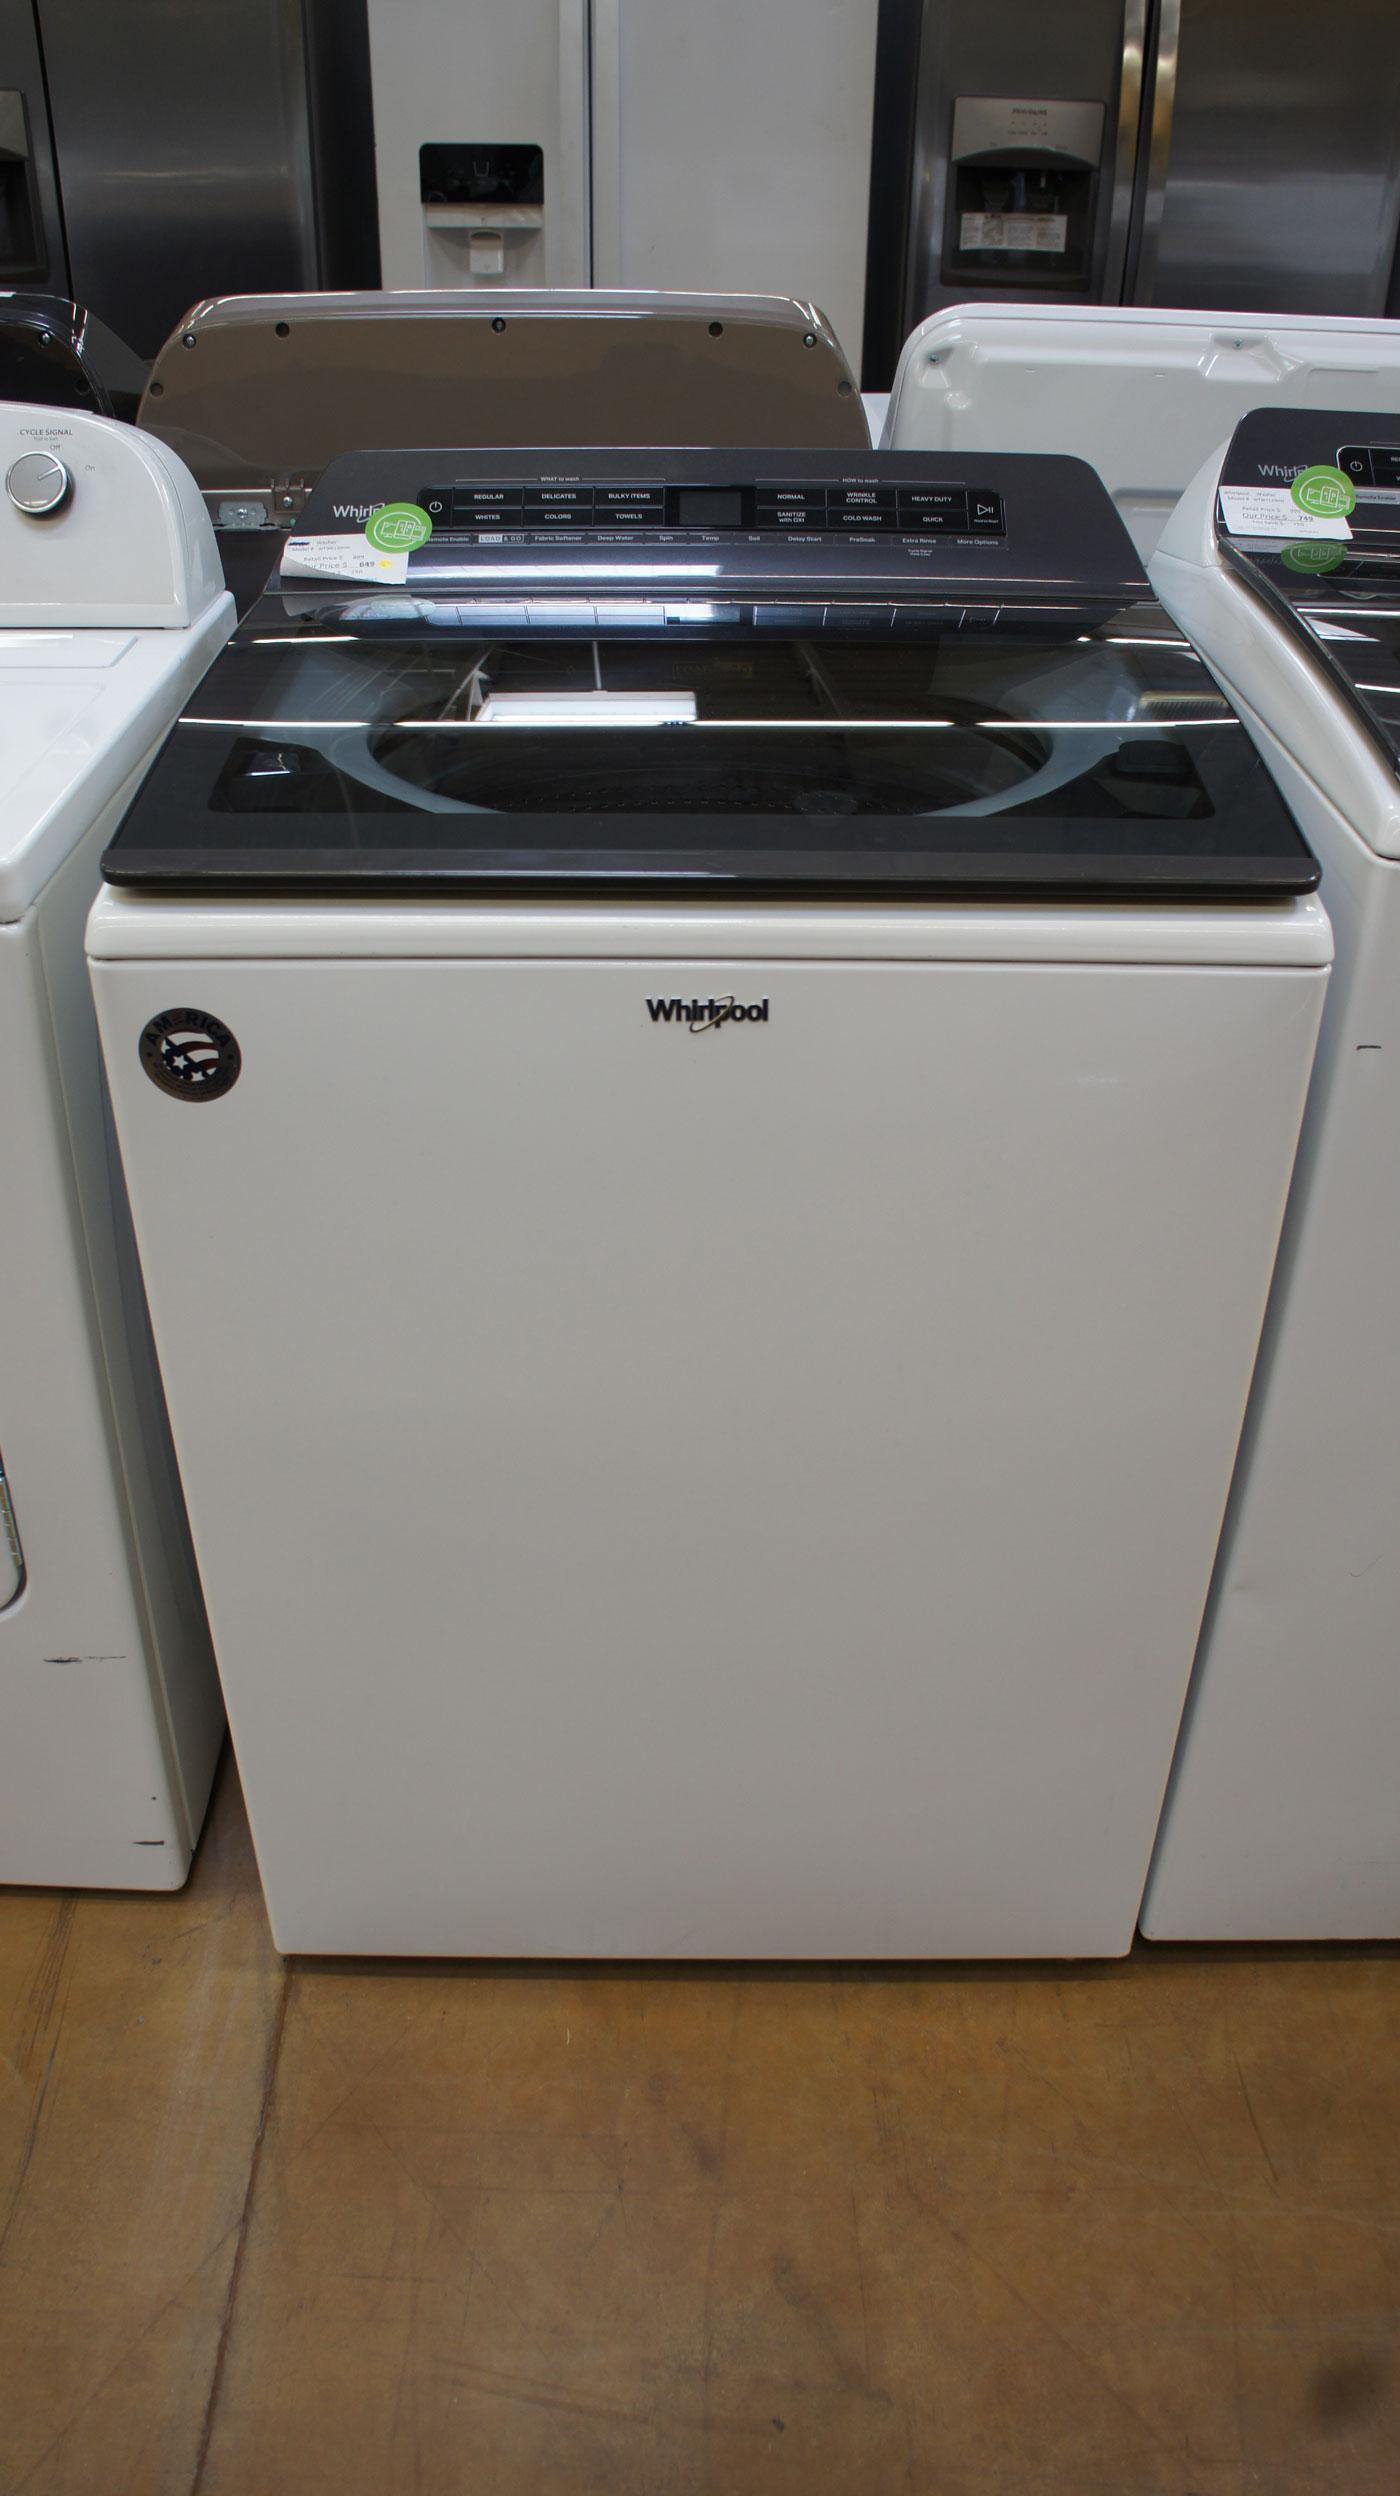 "27"" Whirlpool WTW6120HW 4.8 cu.ft. Top Load Smart Washer"